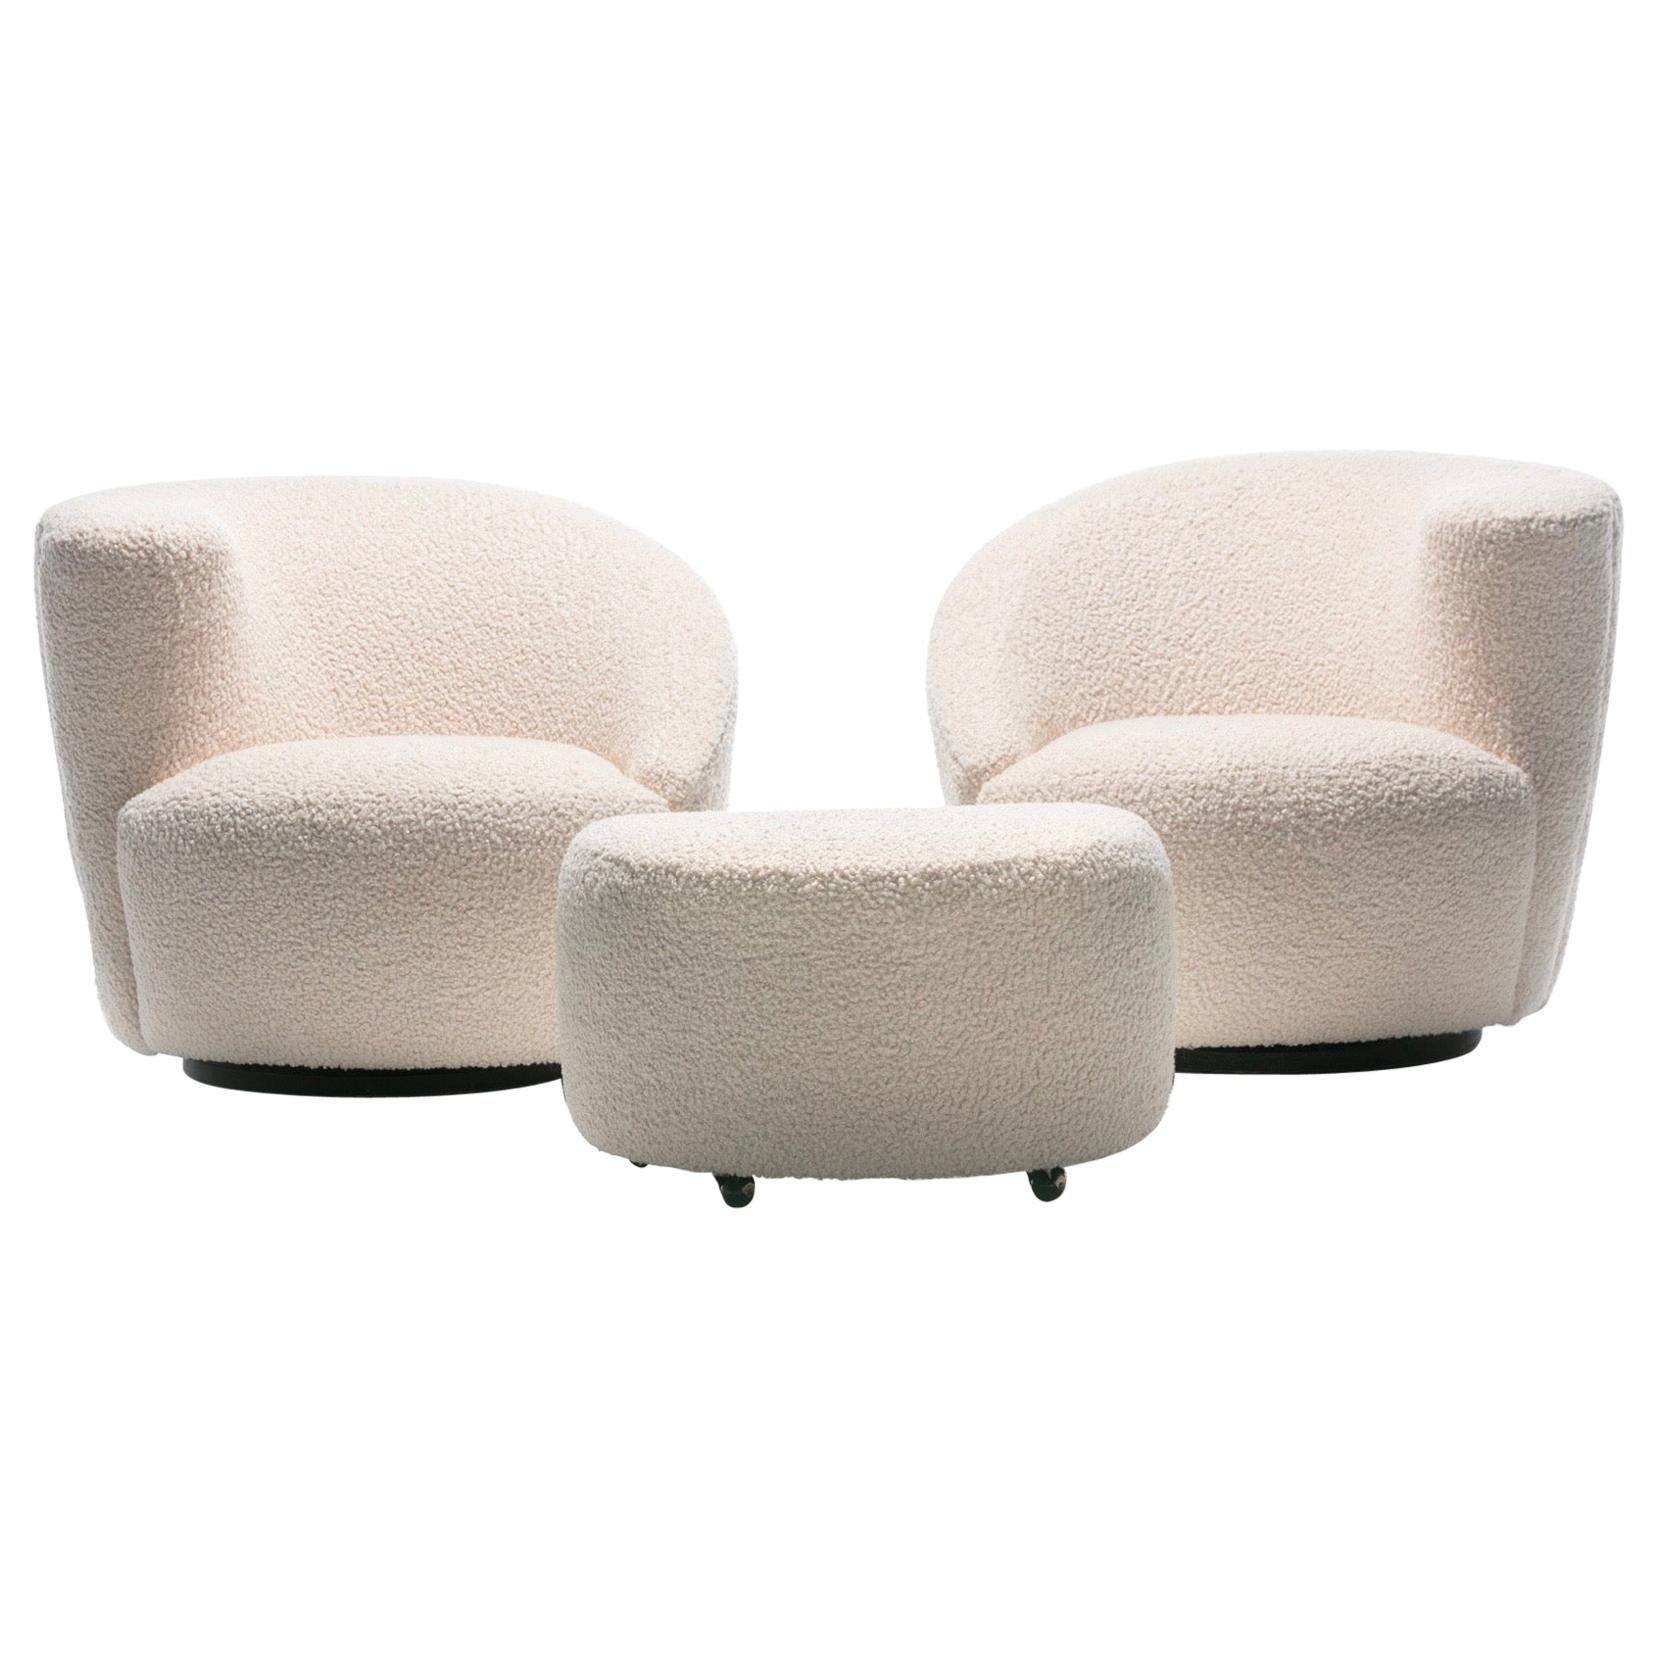 Pair of Vladimir Kagan Nautilus Swivel Lounge Chairs and Ottoman in Ivory Bouclé